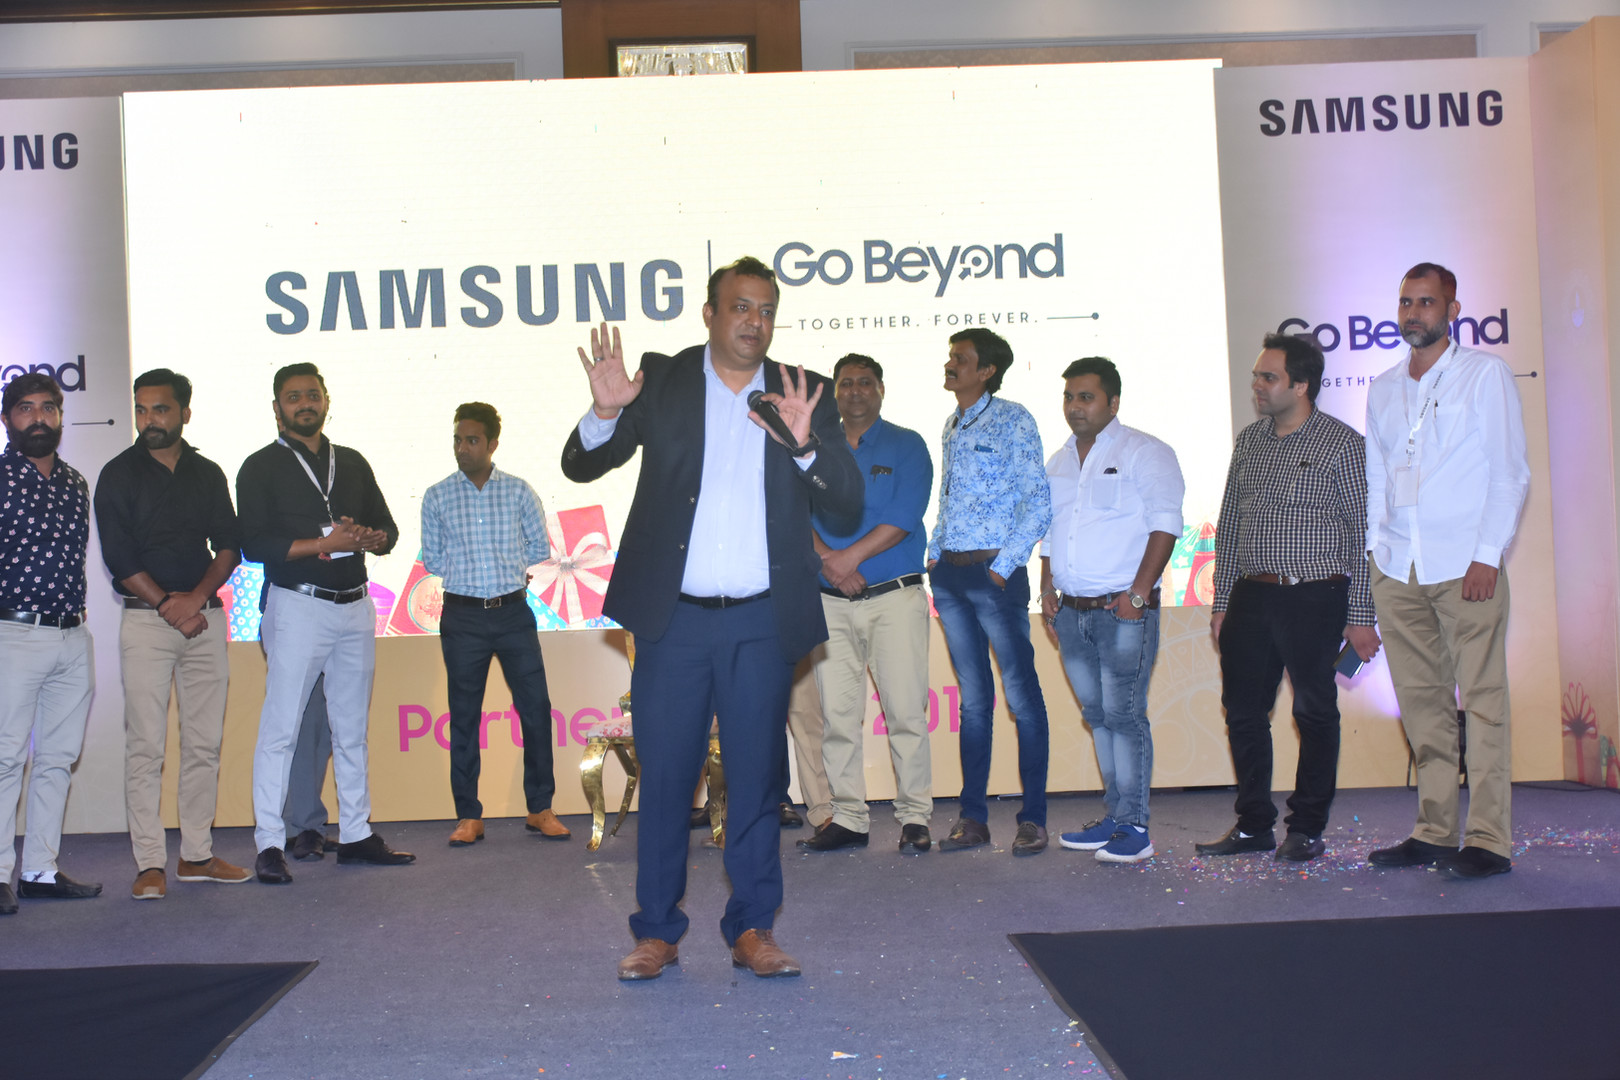 Samsung Events 005.JPG